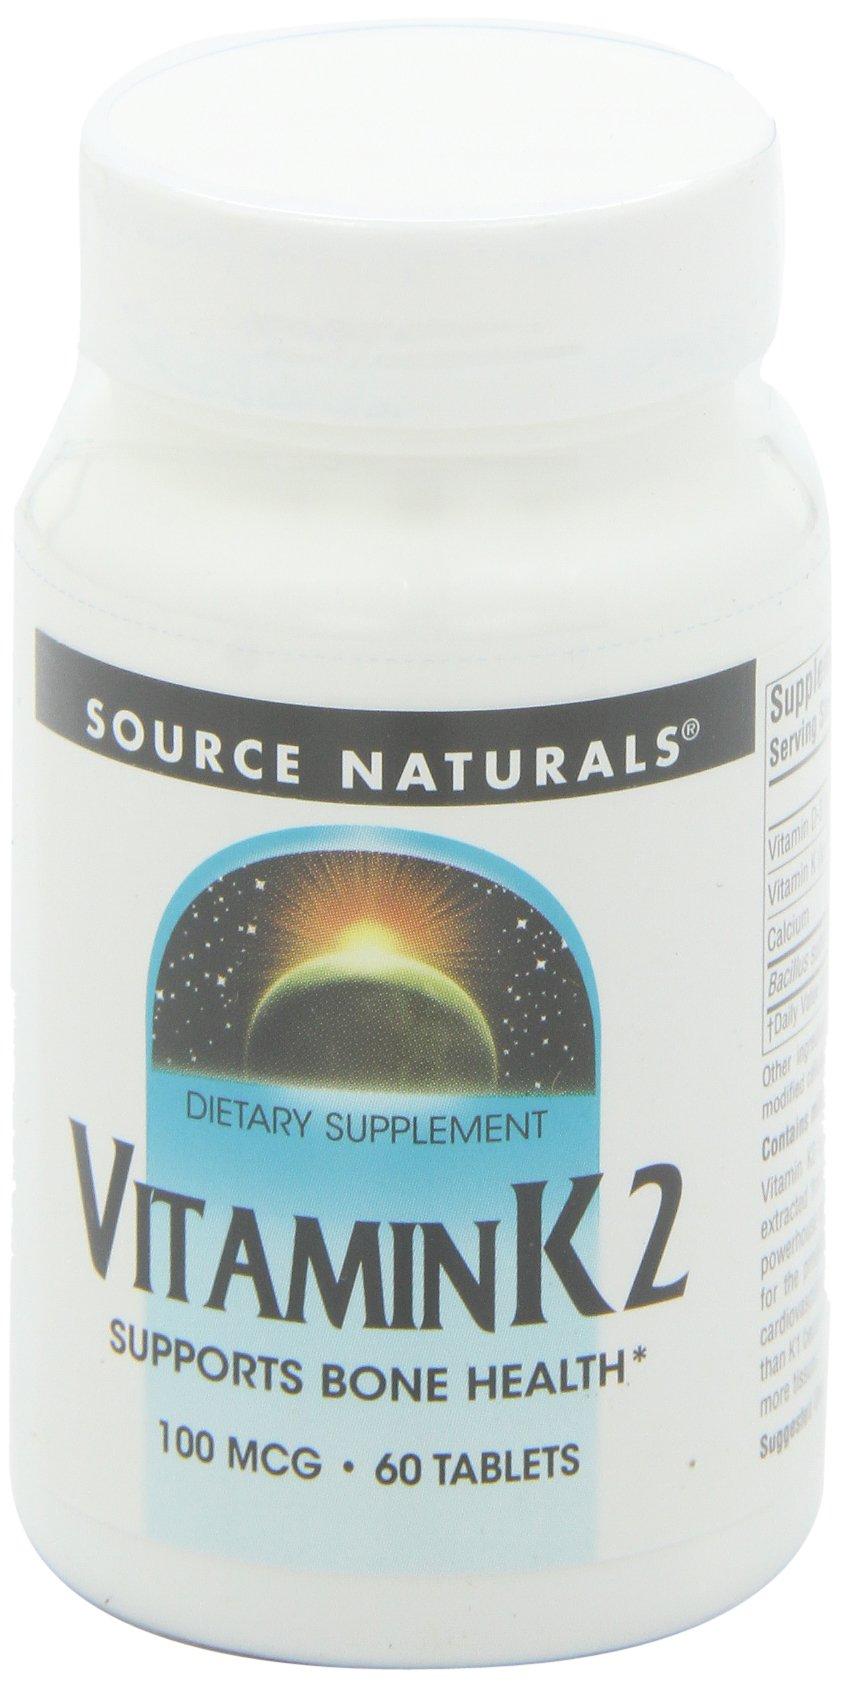 Source Naturals Vitamin K2 100mcg, 60 Tablets (Pack of 2)